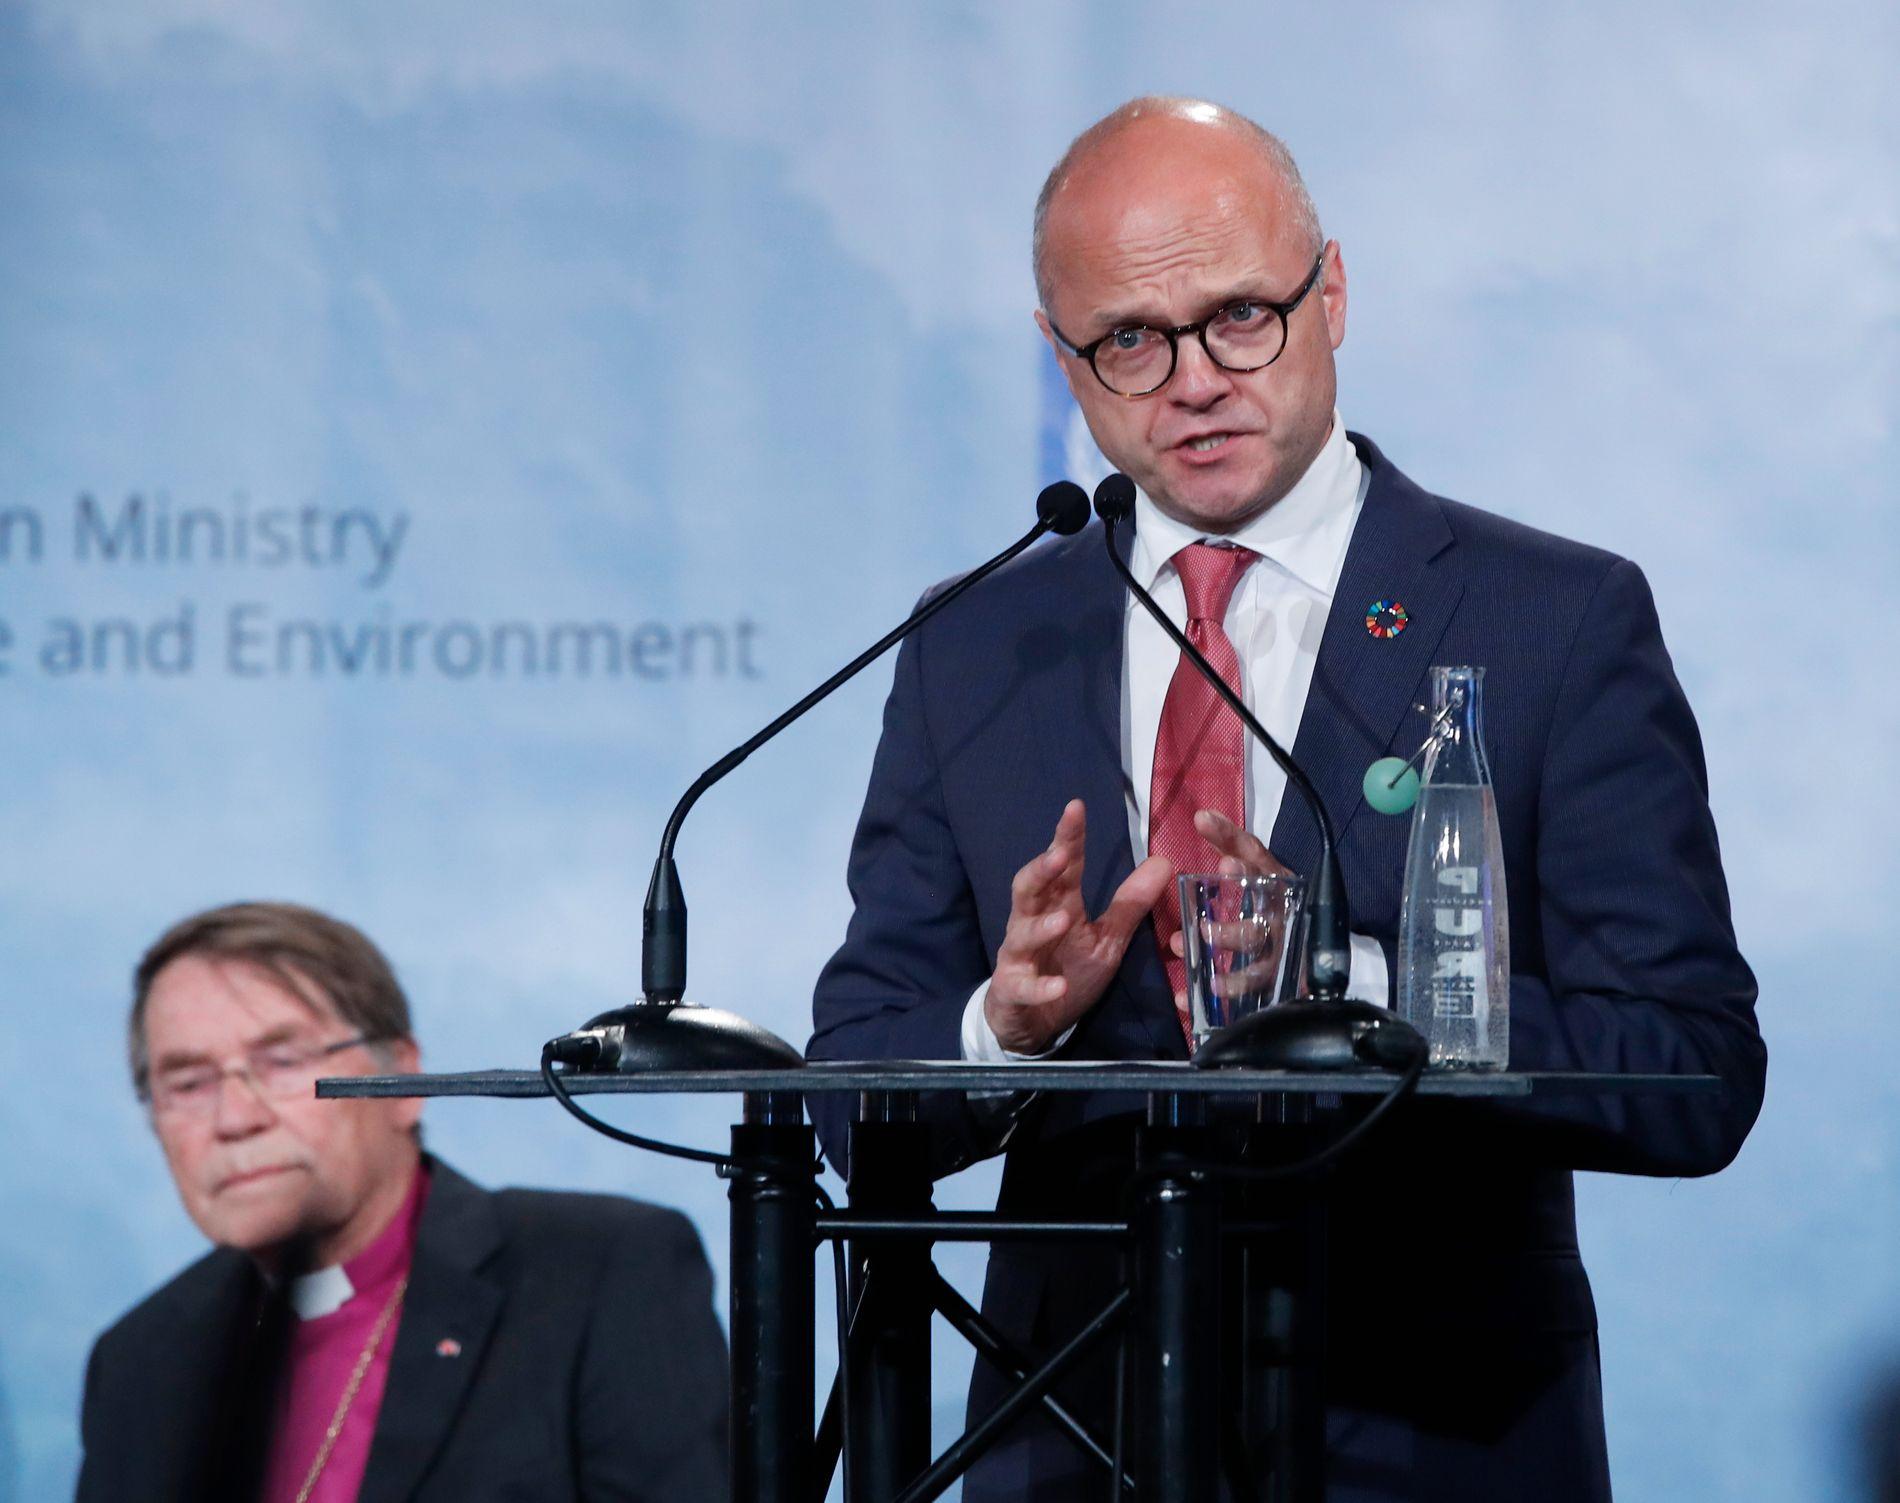 Statsråd Vidar Helgesen (t.h.) har signert miljøavtale med den amerikanske delstaten California. Foto: Lise Åserud / NTB scanpix